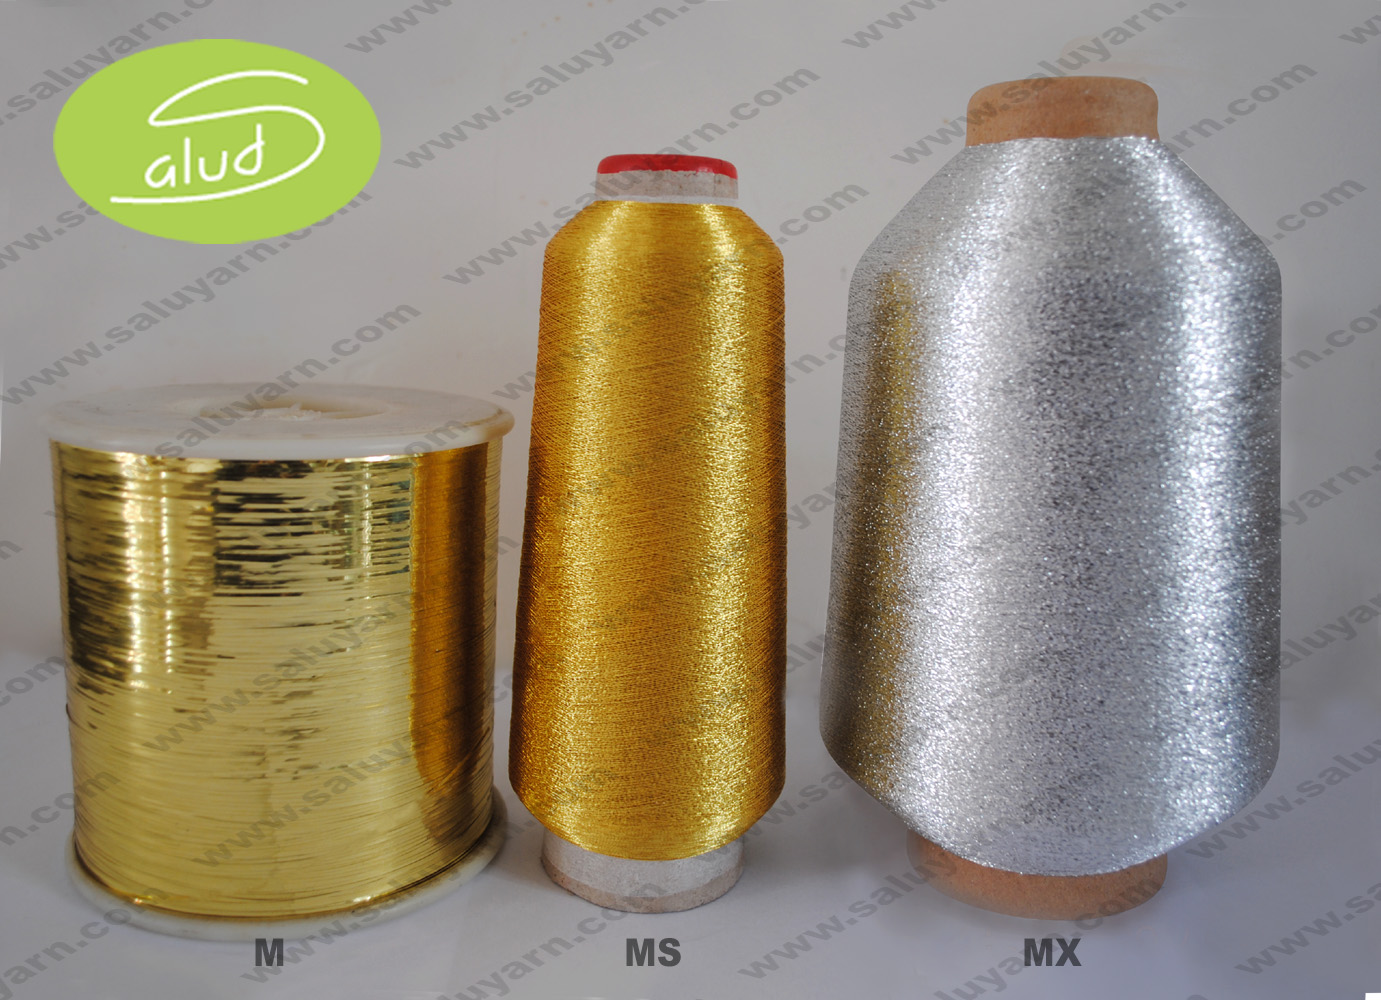 M MH MX MS type metallic yarn/ homemade fancy pattern